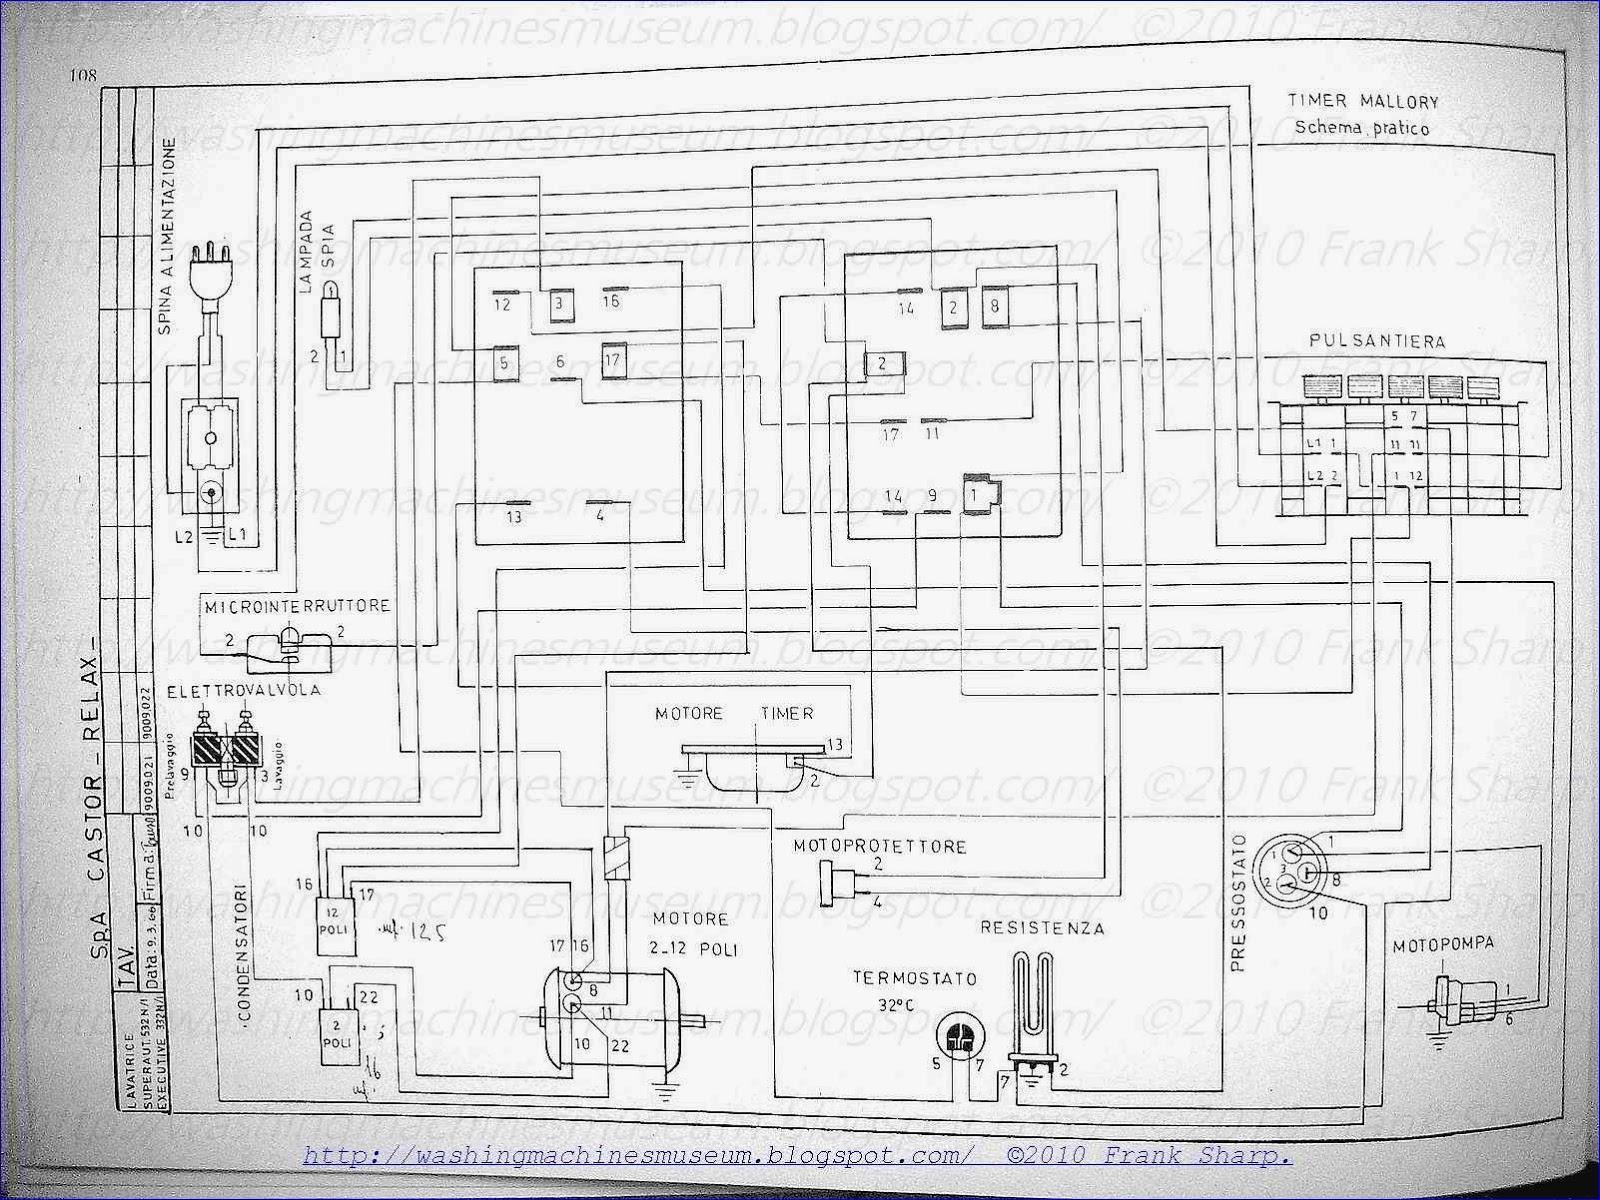 Ge Washer Wiring Diagram Mod Wjrr4170e4ww - Duramax Fuel Filter Float -  hyundaiii.tukune.jeanjaures37.fr   Ge Washer Wiring Diagram Mod Wjrr4170e4ww      Wiring Diagram Resource